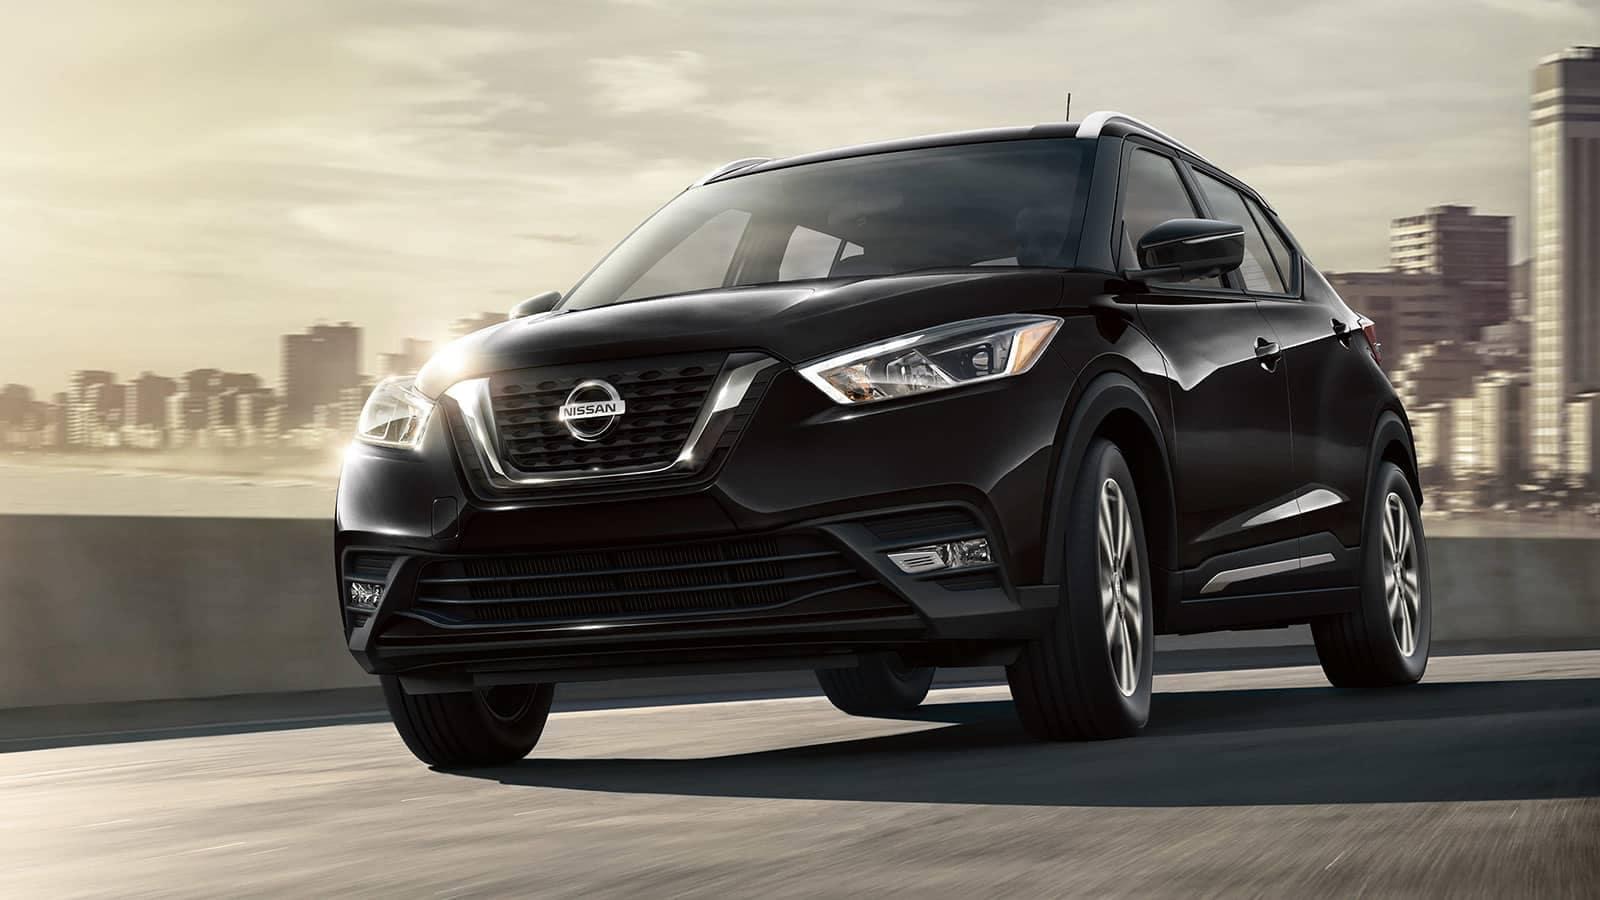 2019 Nissan Kicks design lines